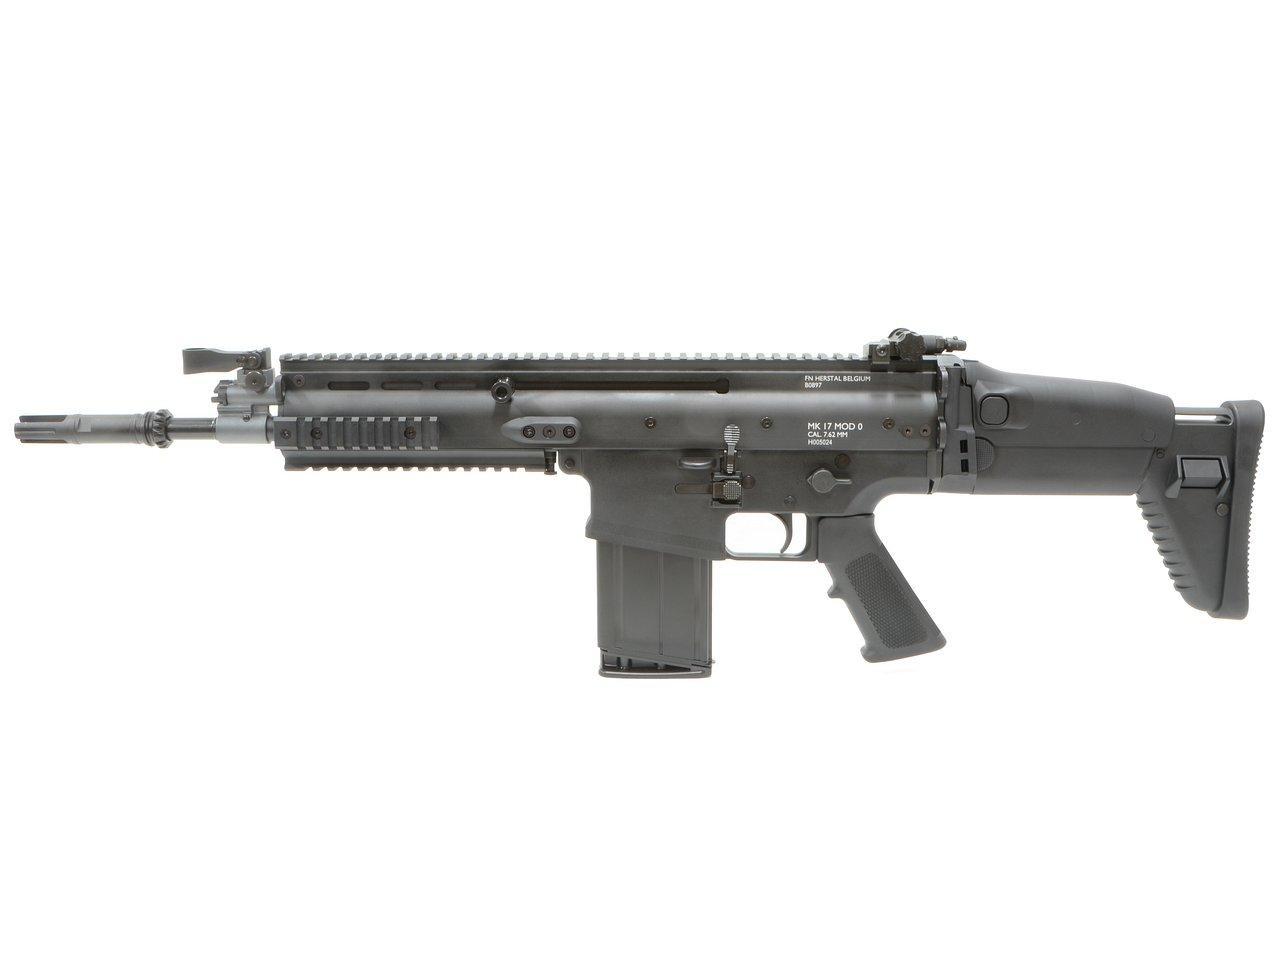 CyberGun FN SCAR-H GBBR (Mk17 JPversion) BK